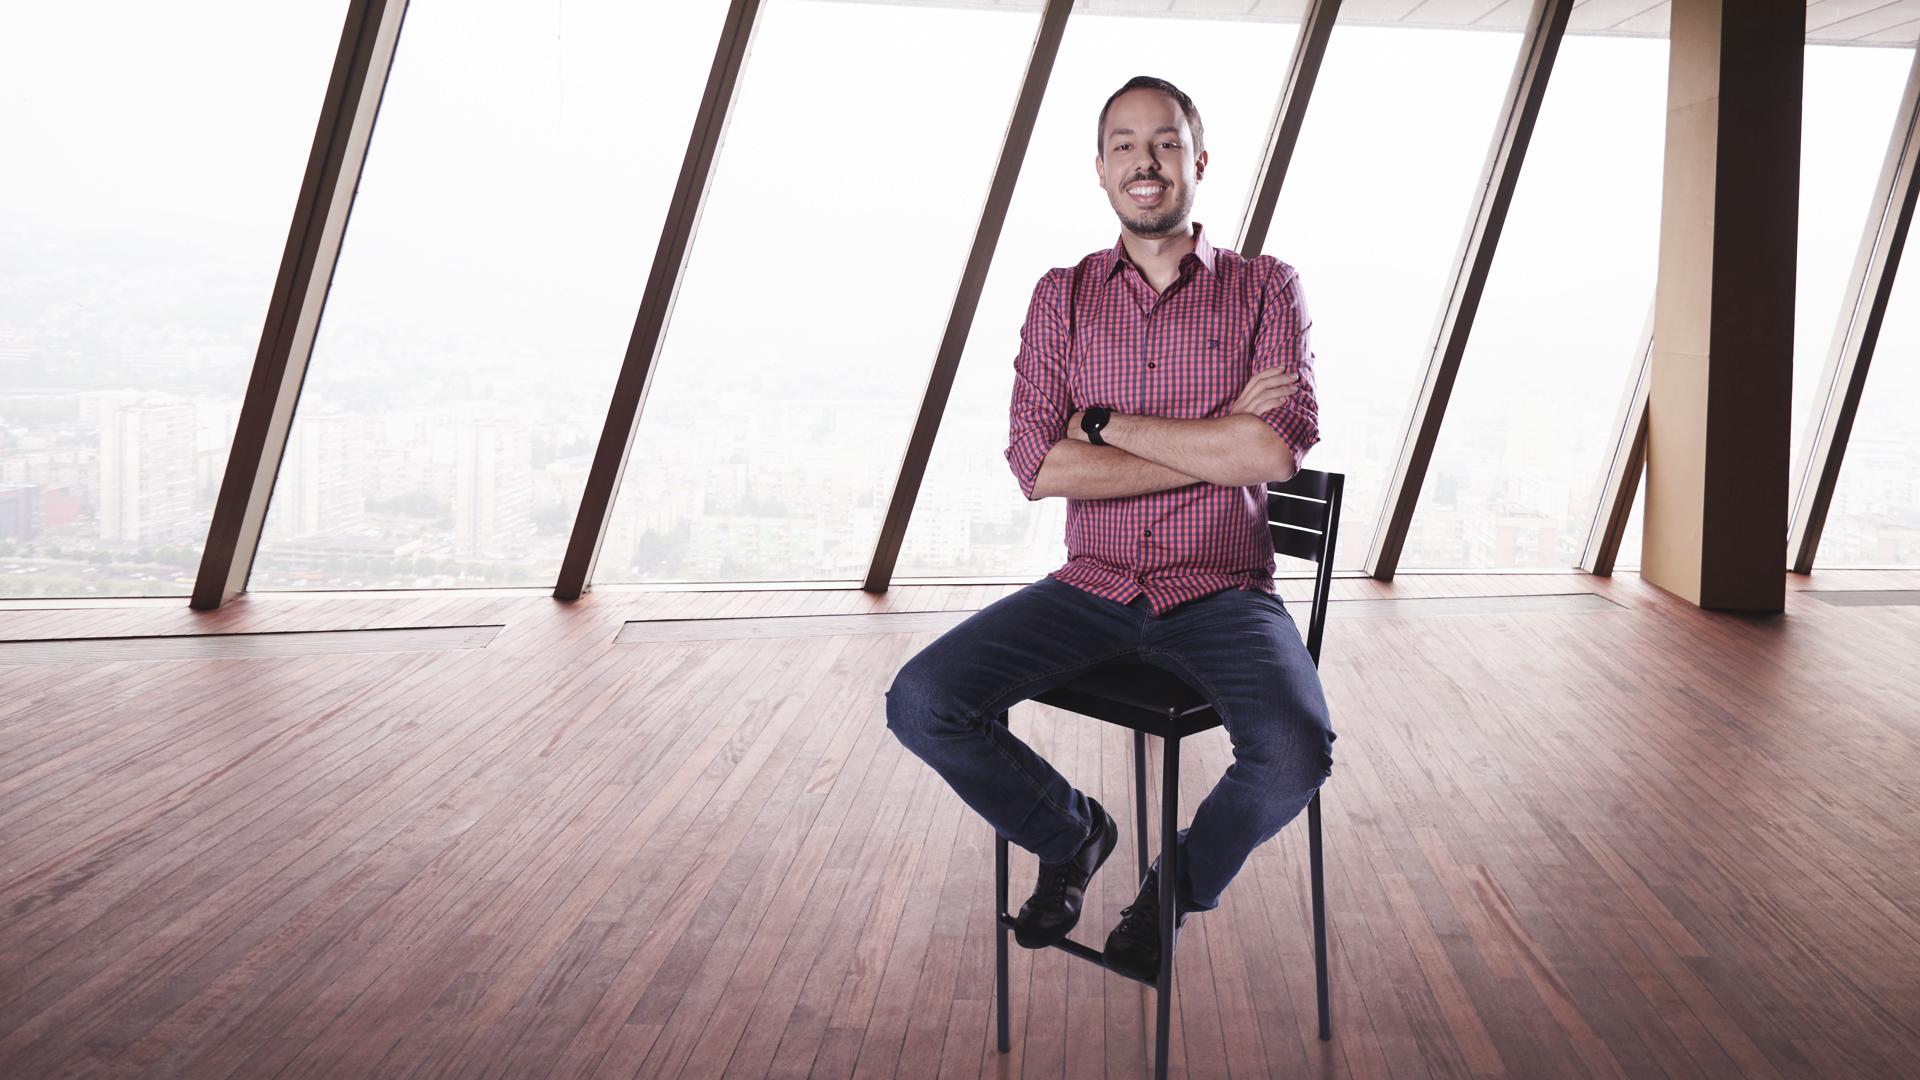 Como entender o Lean Start-Up na história do Gustavo Caetano -por Luciana Kimi